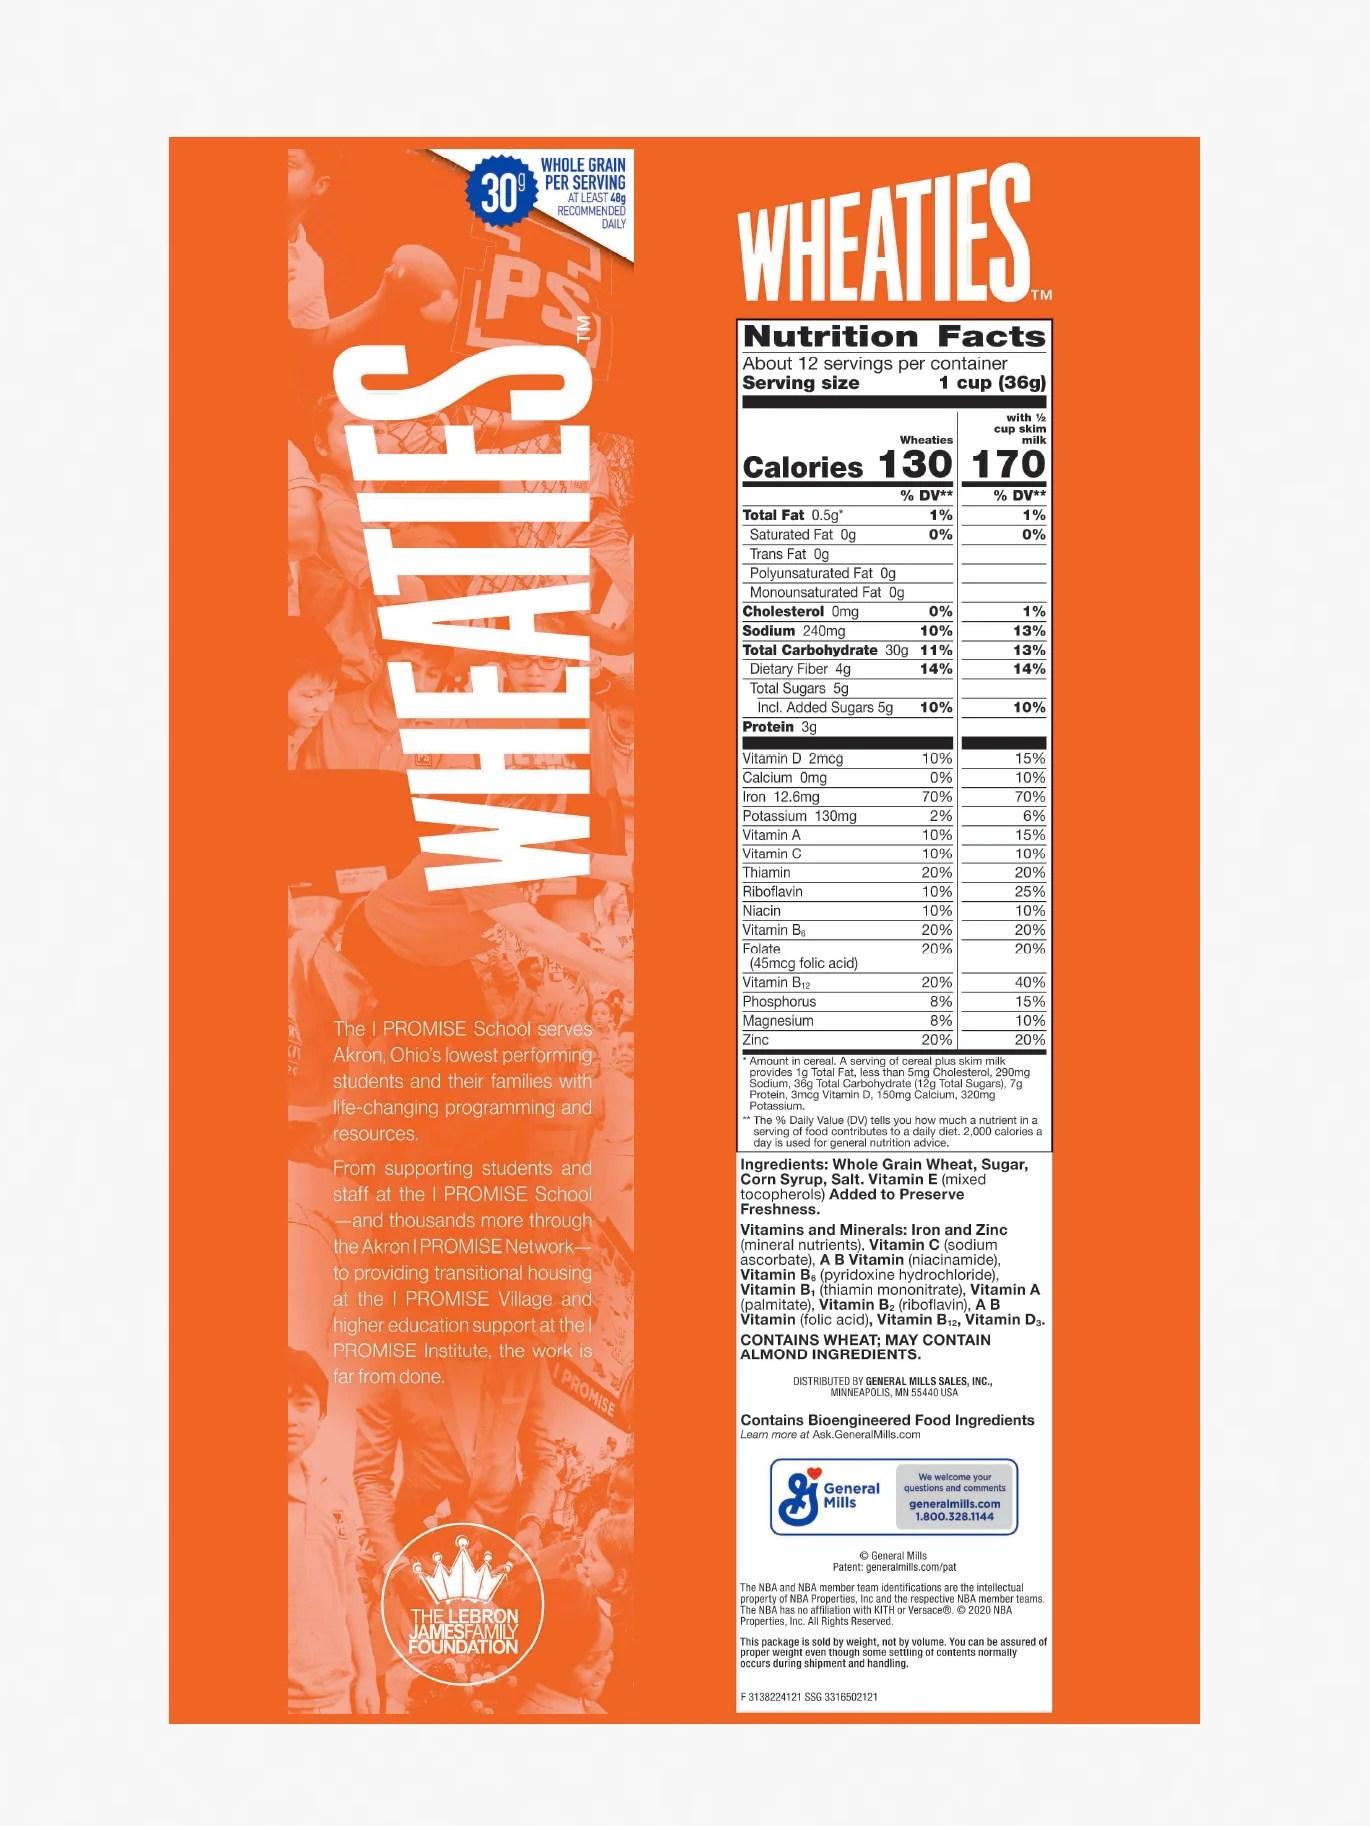 Wheaties Nutrition Facts : wheaties, nutrition, facts, LeBron, James, PROMISE, Wheaties